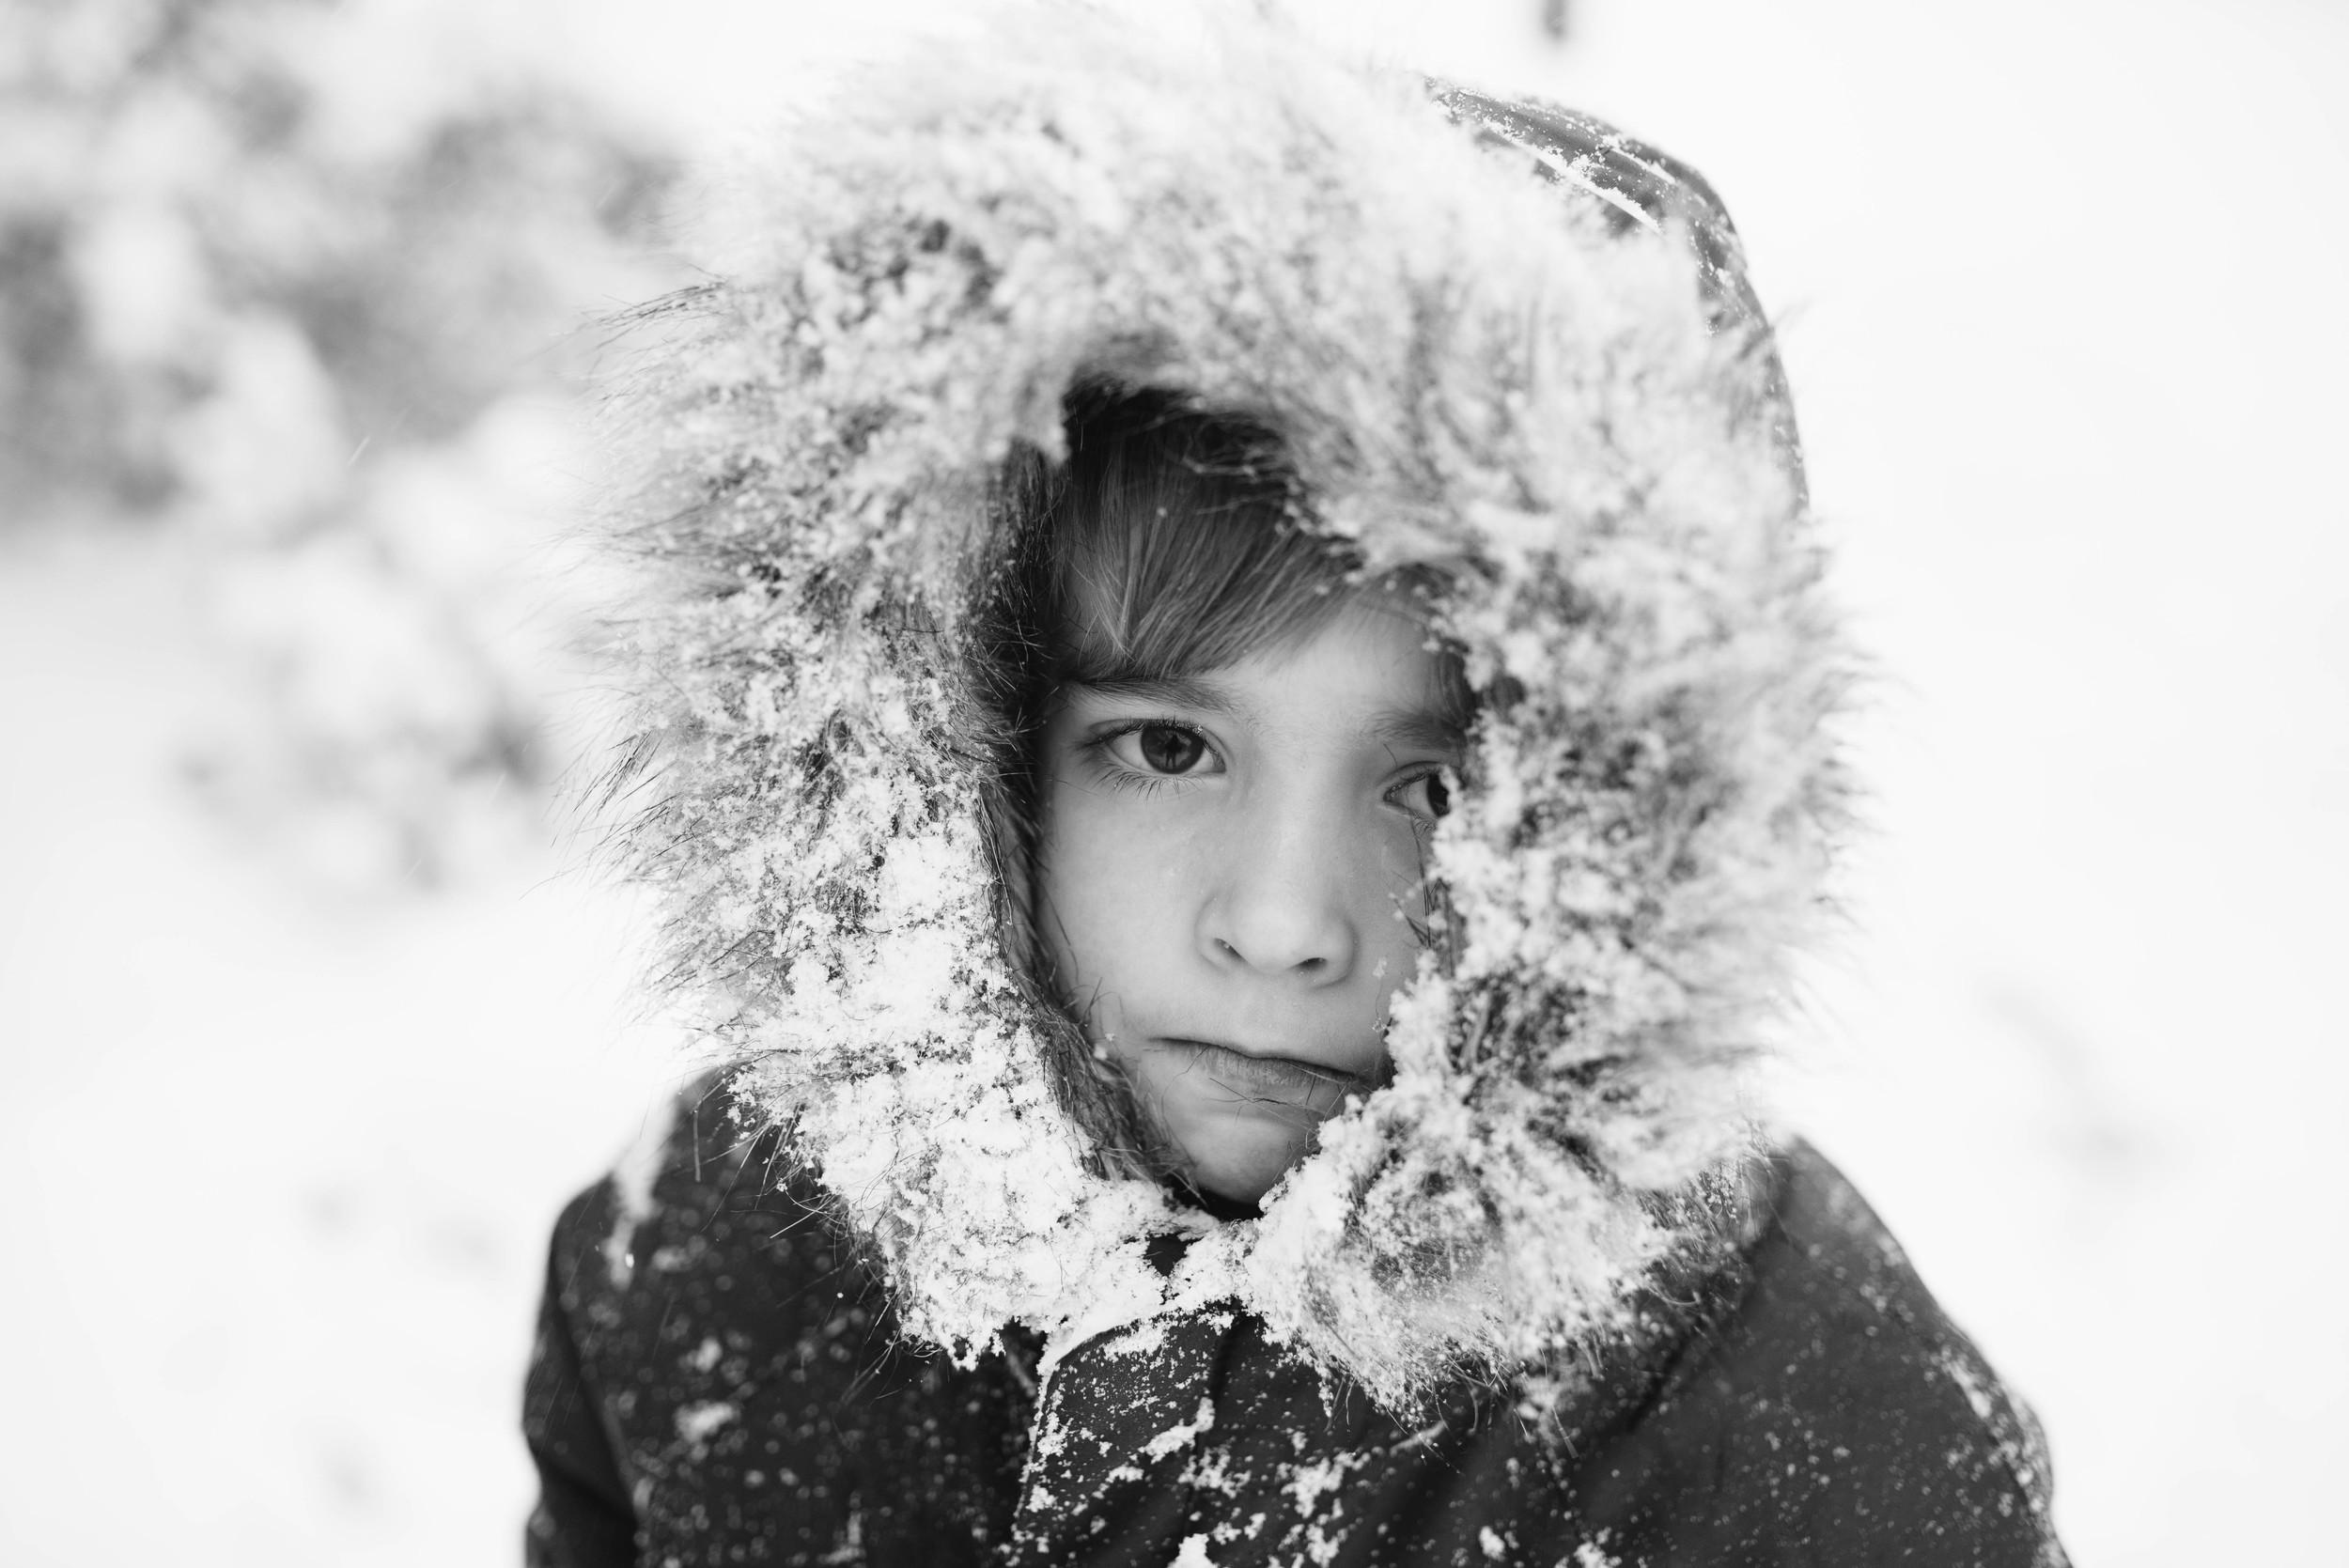 family photographer snow day portrait Mariah Fisher.jpg